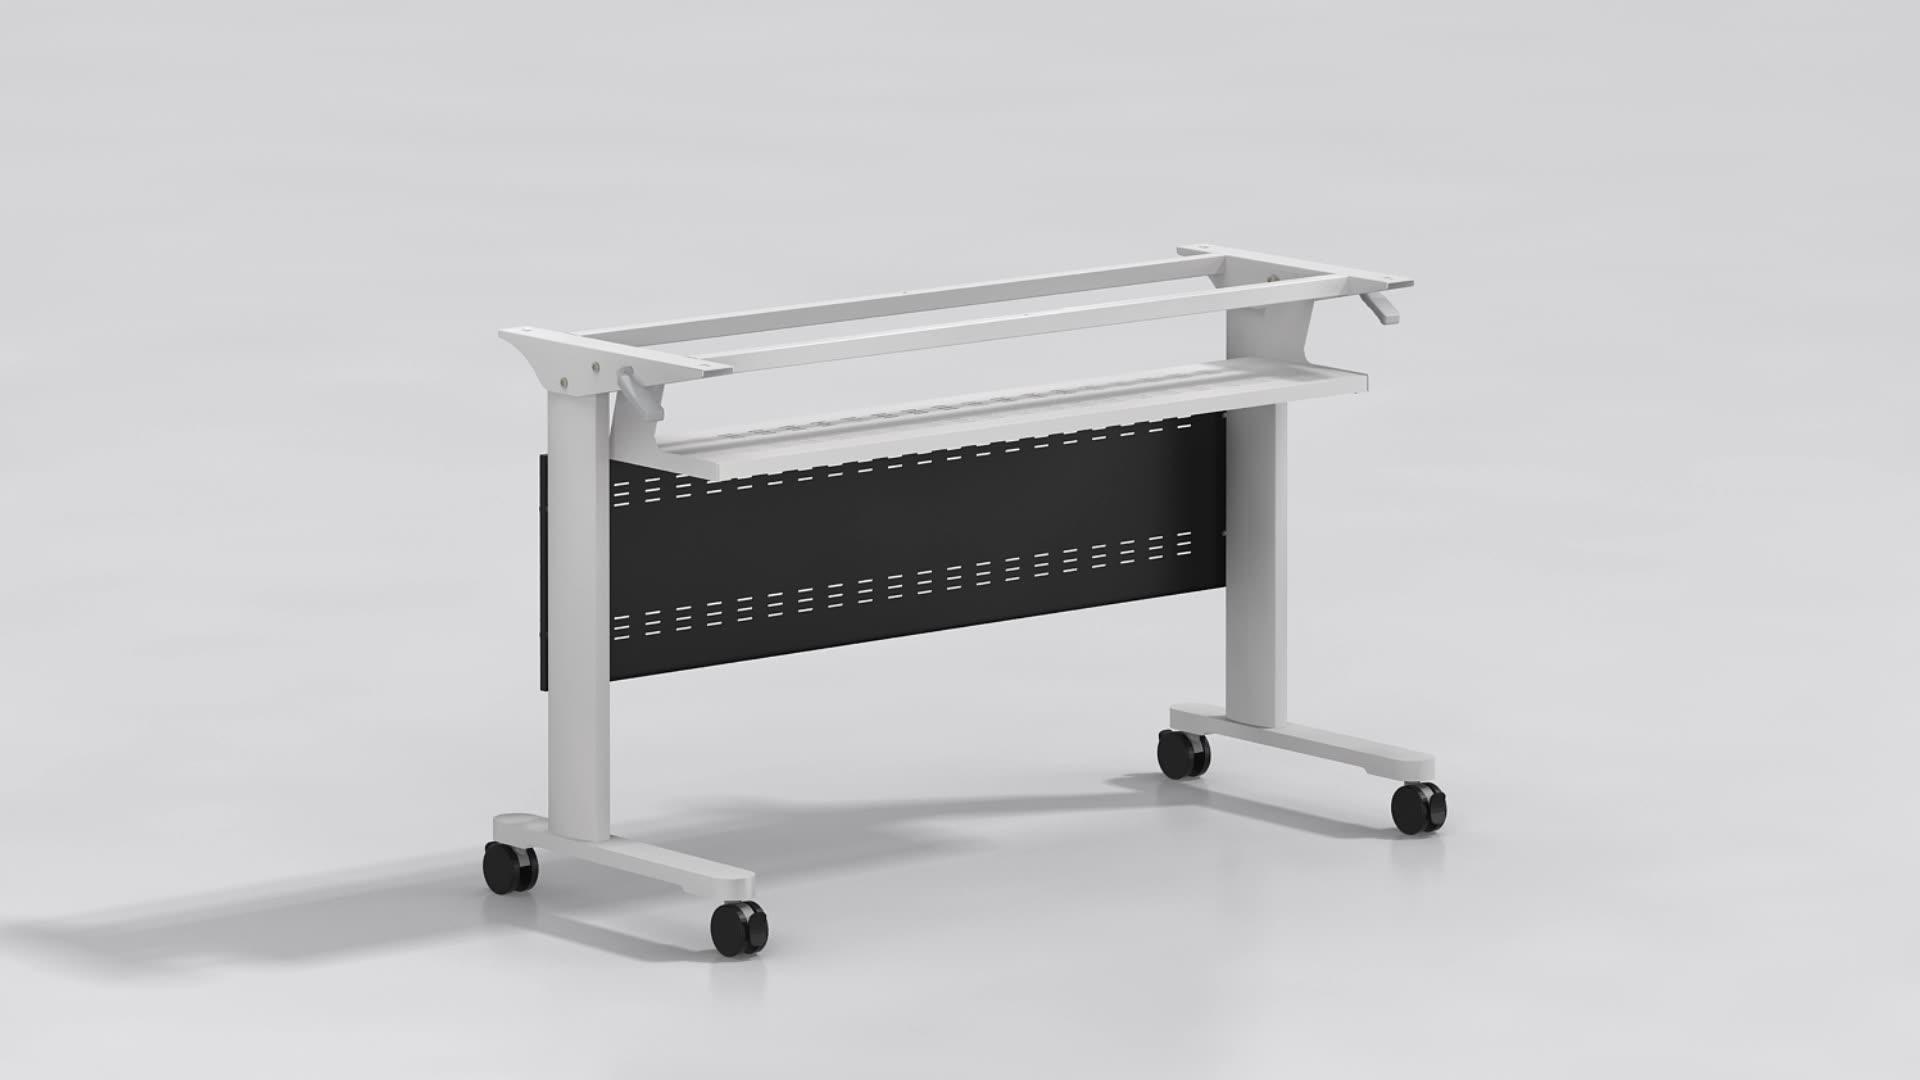 Modern Design Folding Desk Movable Conference Room Training Table Desk With Wheels